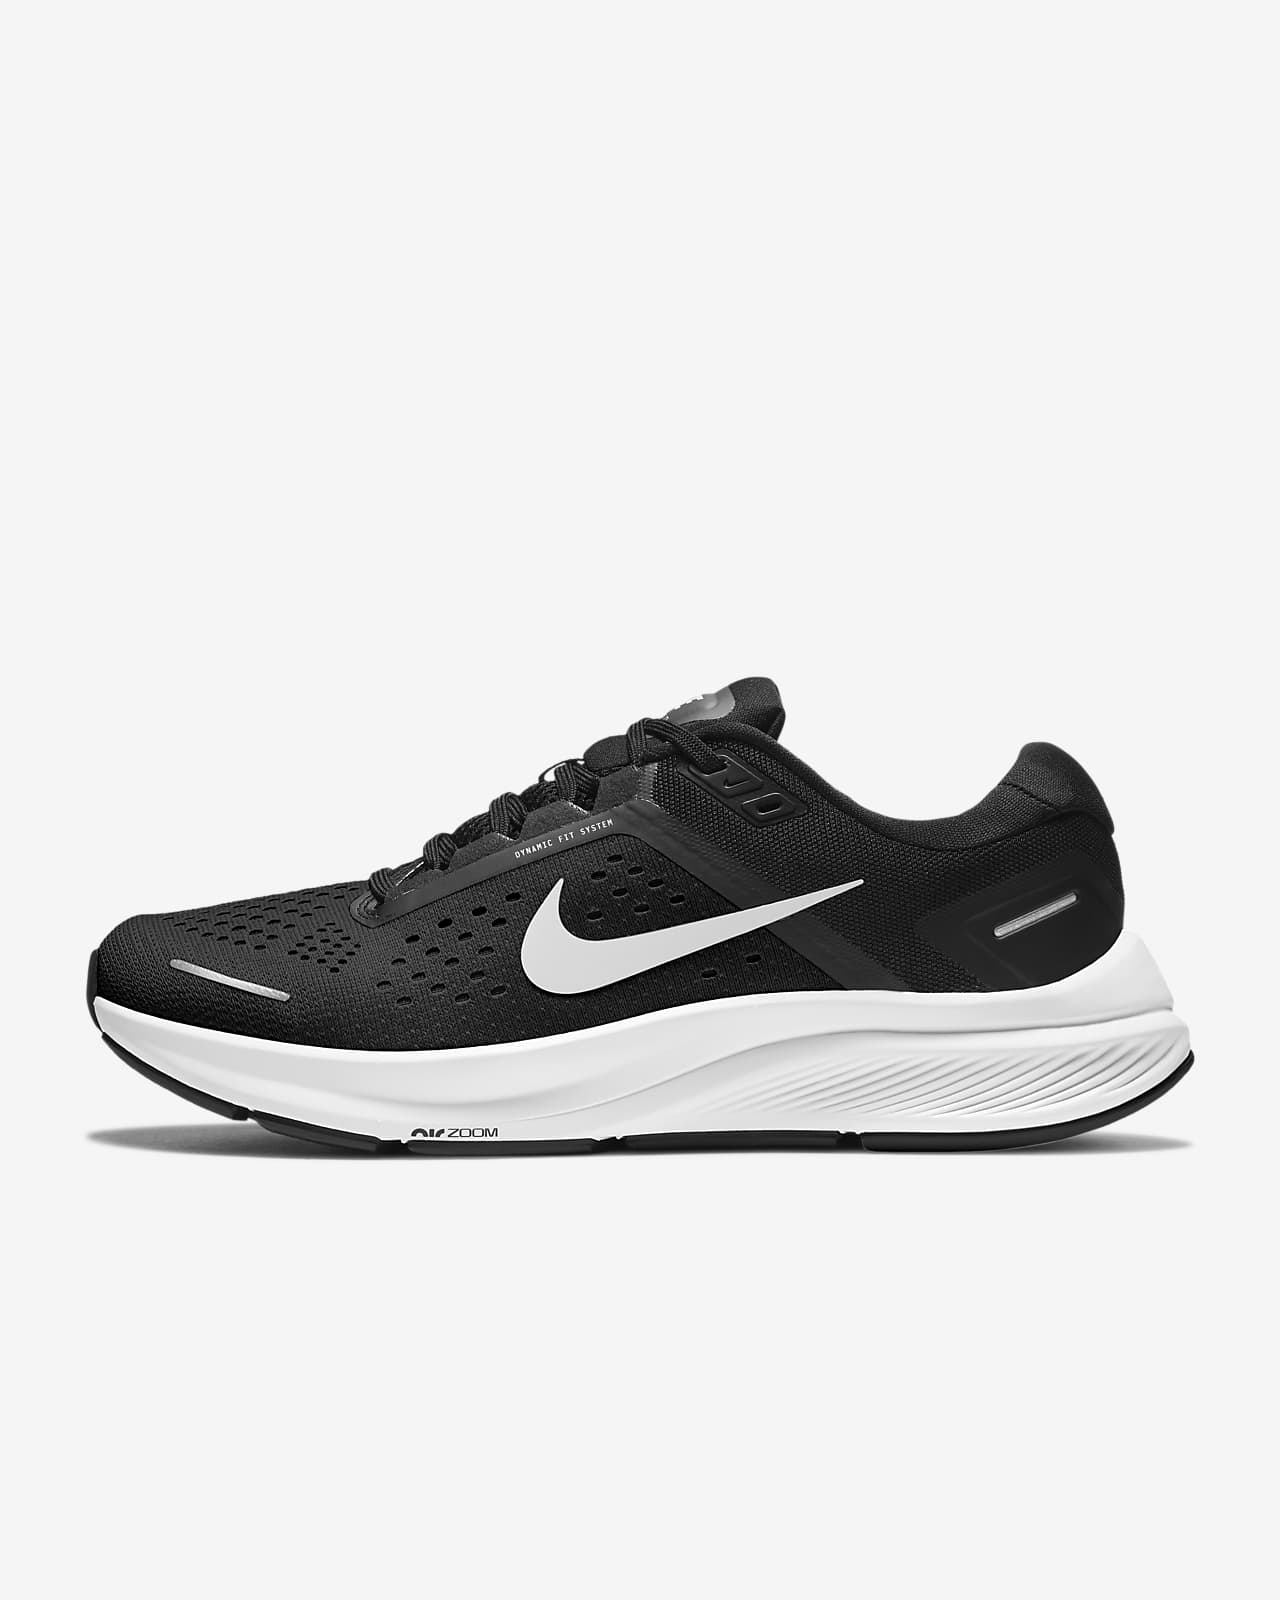 Nike Air Zoom Structure 23 Damen-Laufschuh